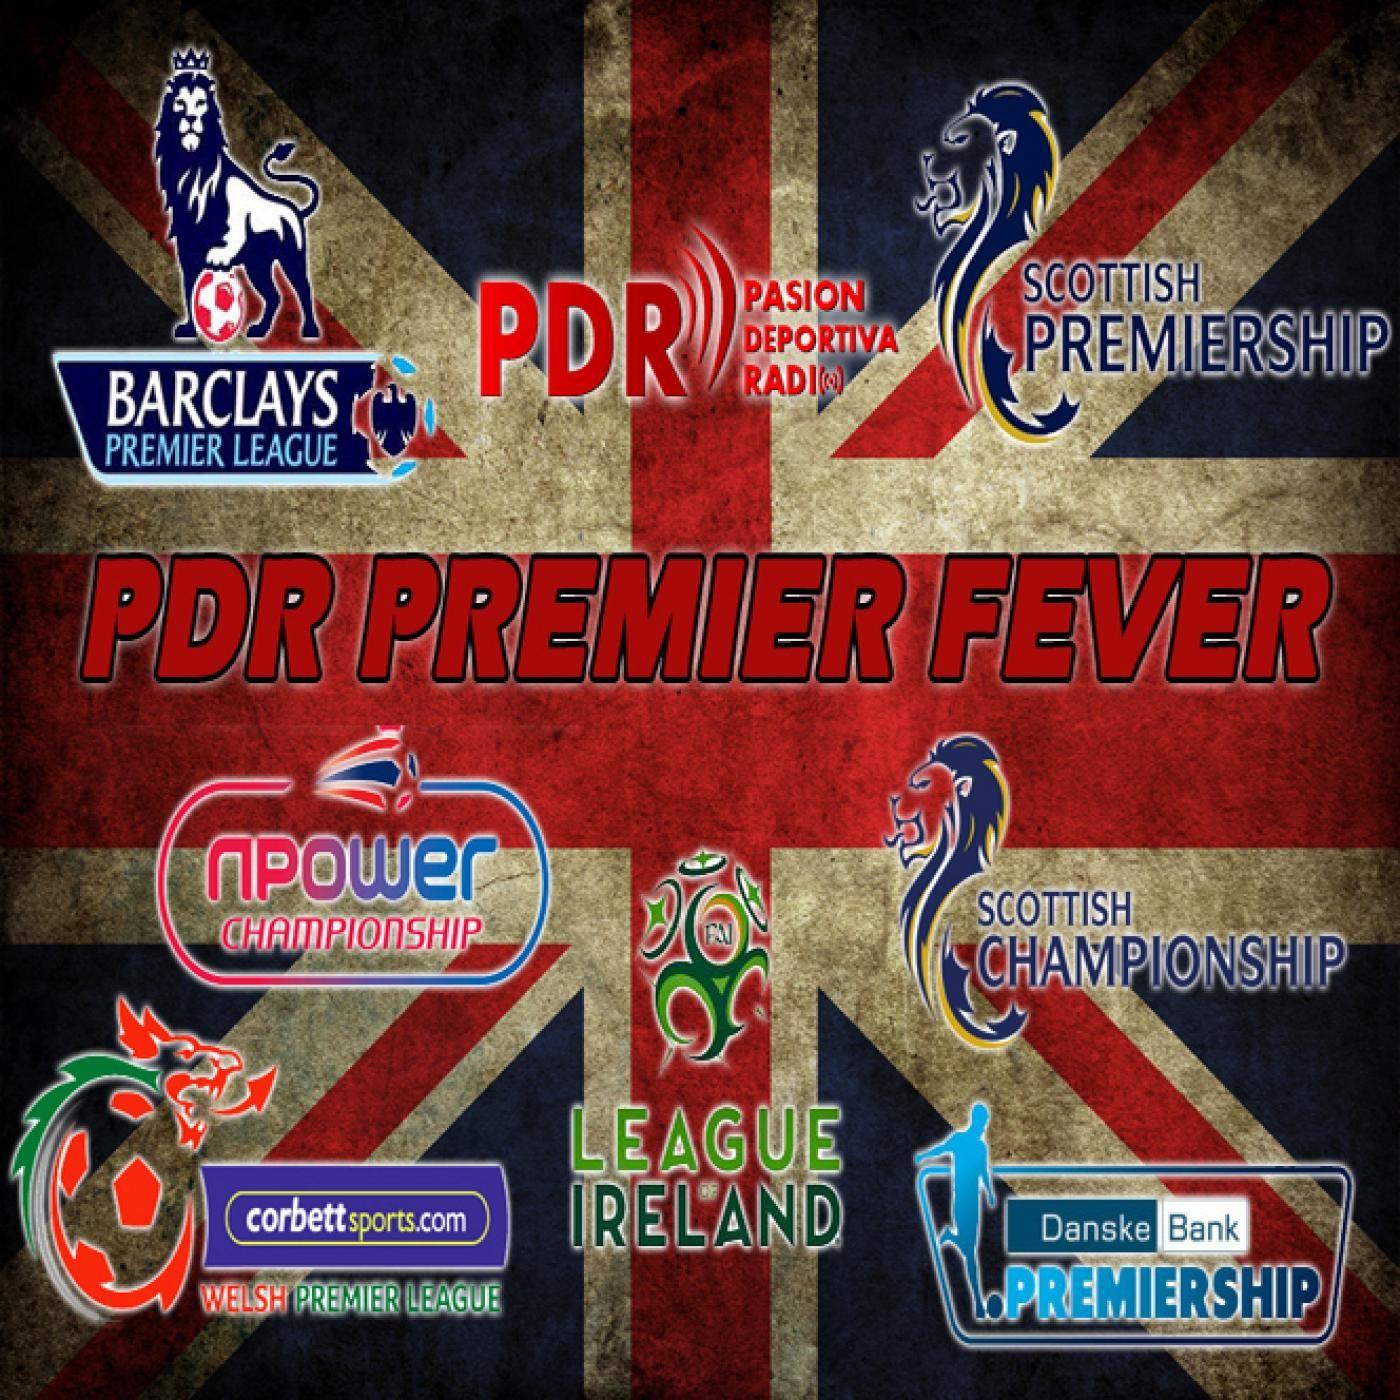 <![CDATA[Programa PDR Premier FFever]]>